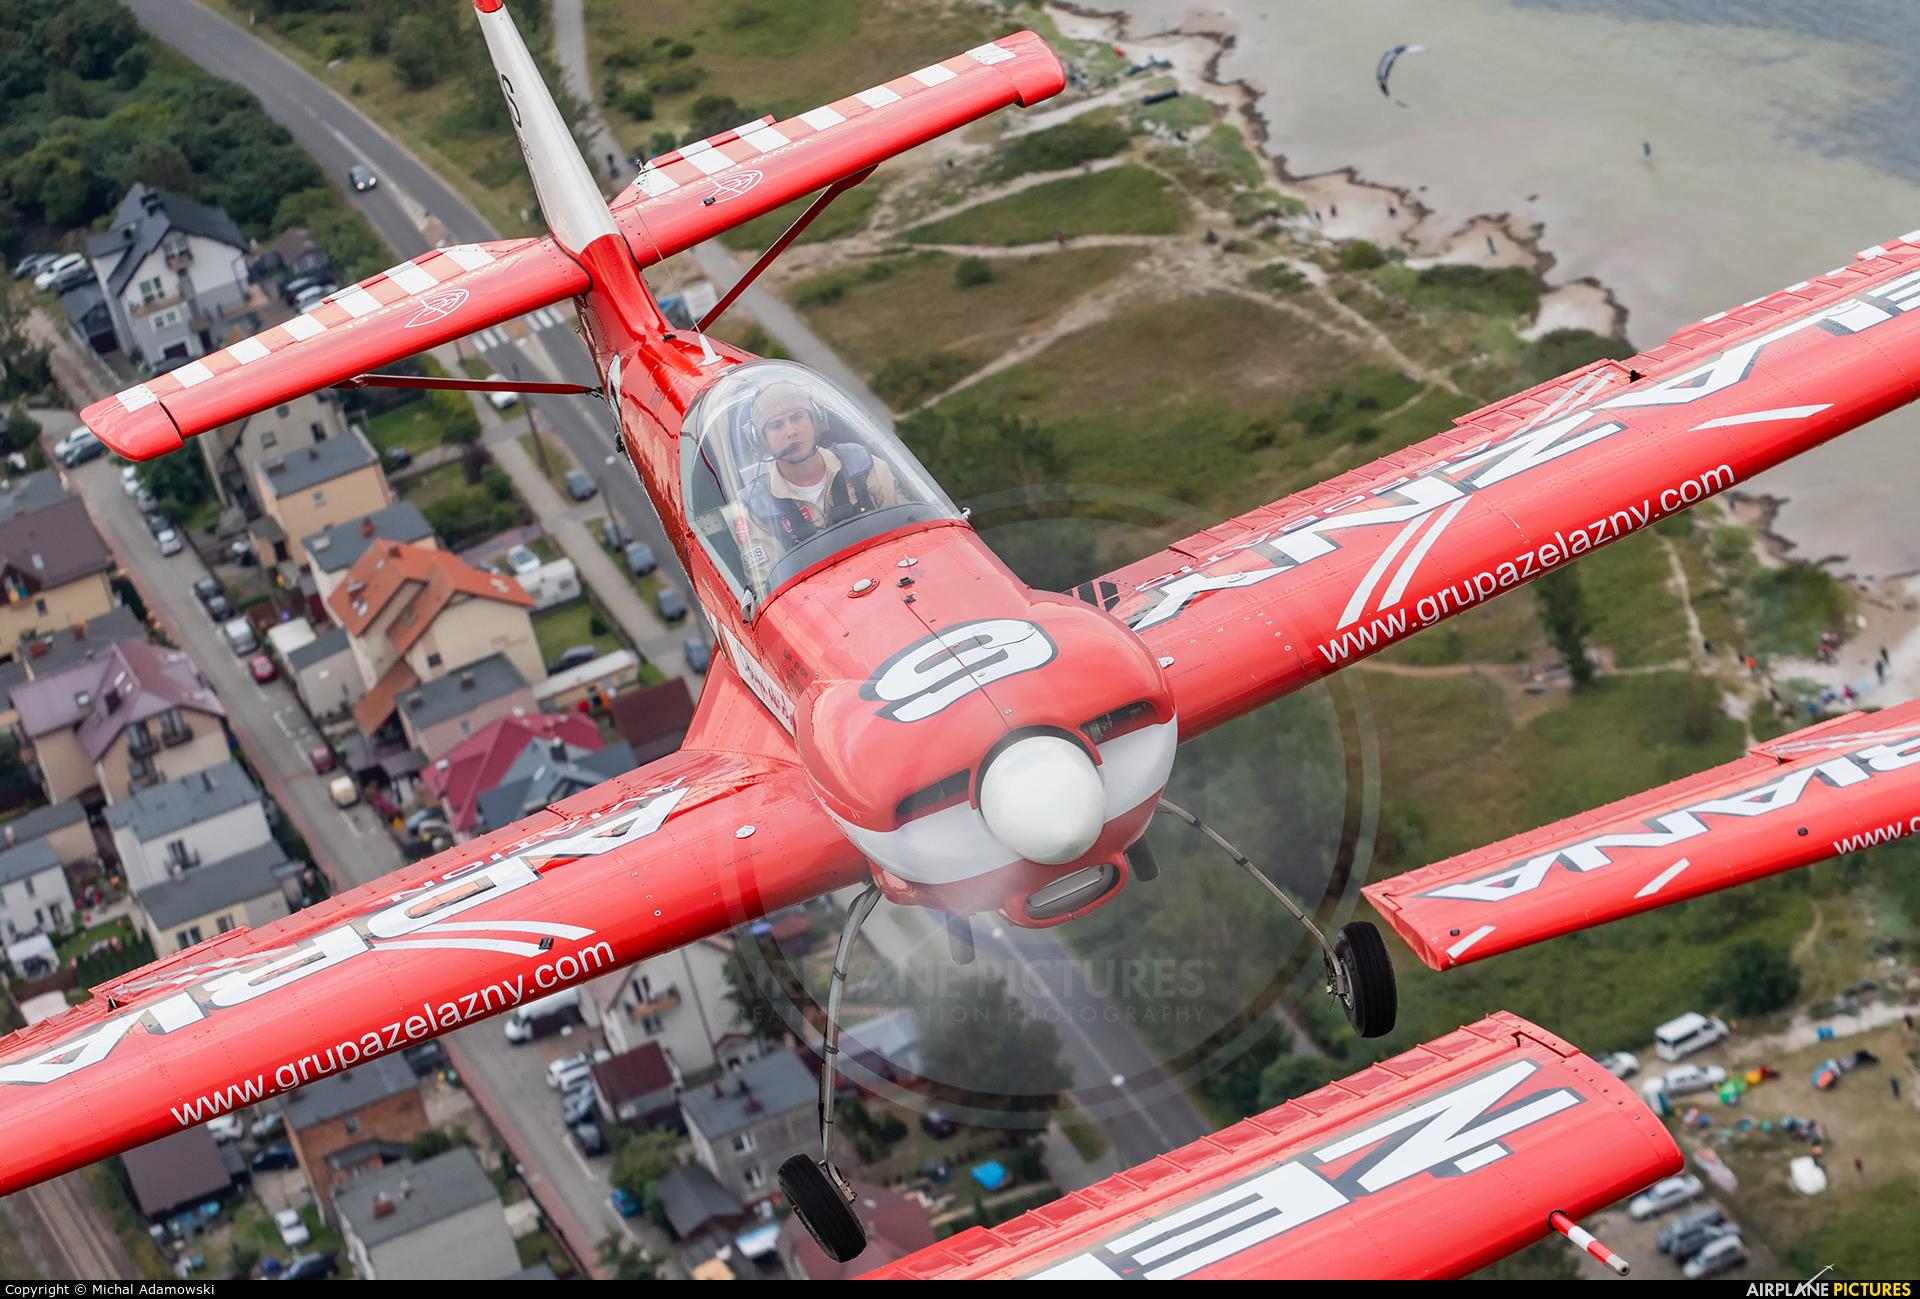 Grupa Akrobacyjna Żelazny - Acrobatic Group SP-AUC aircraft at In Flight - Poland